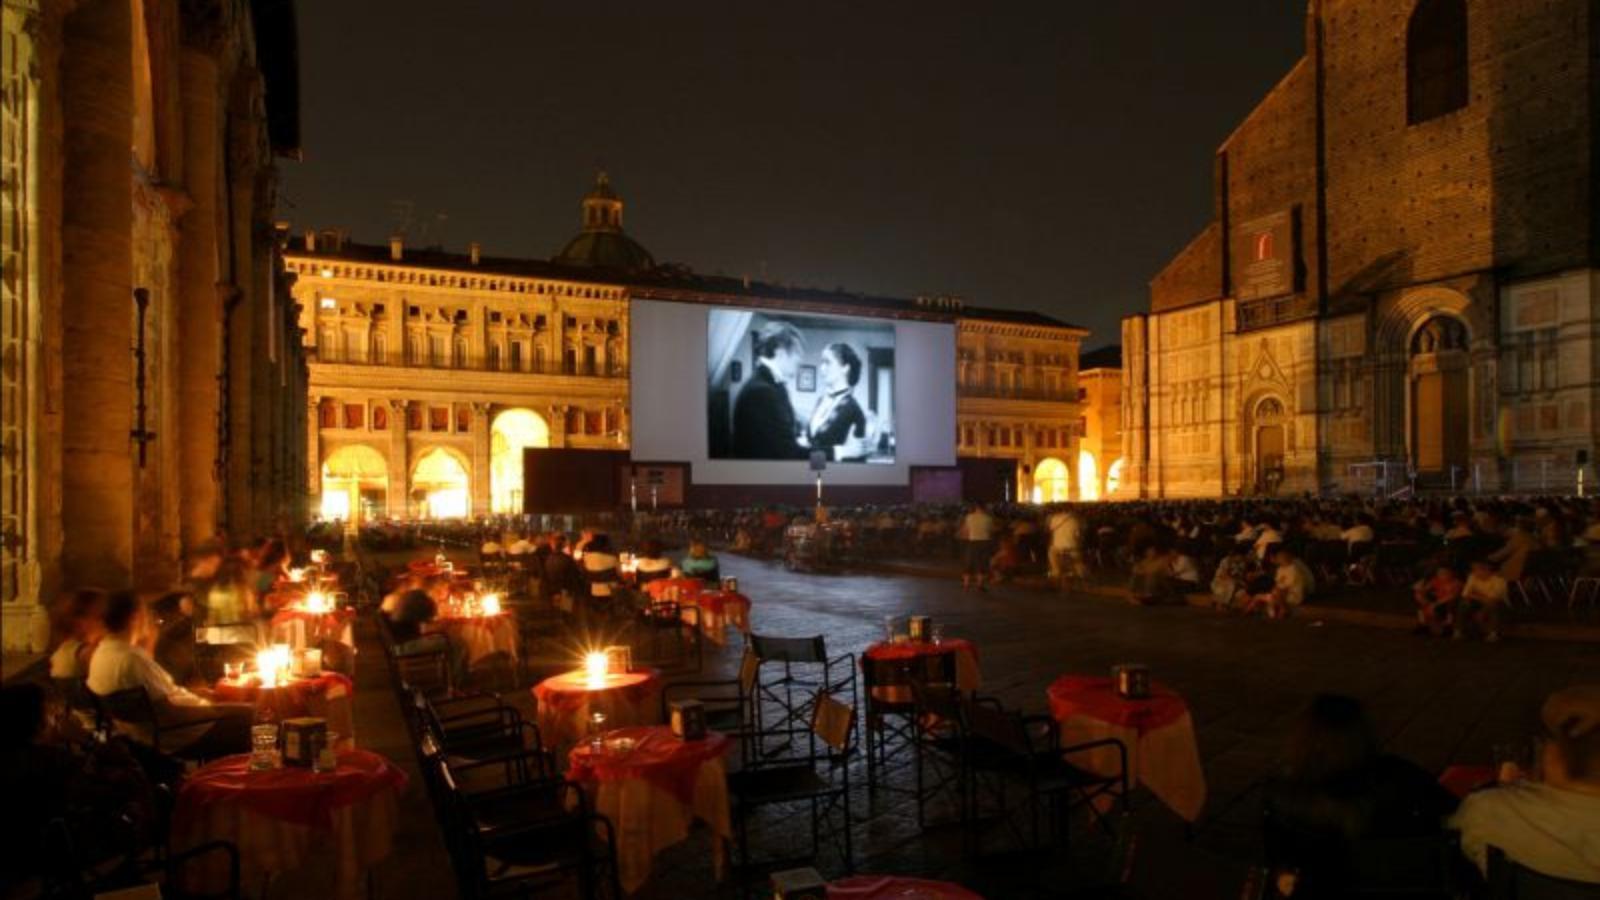 Cinema, video